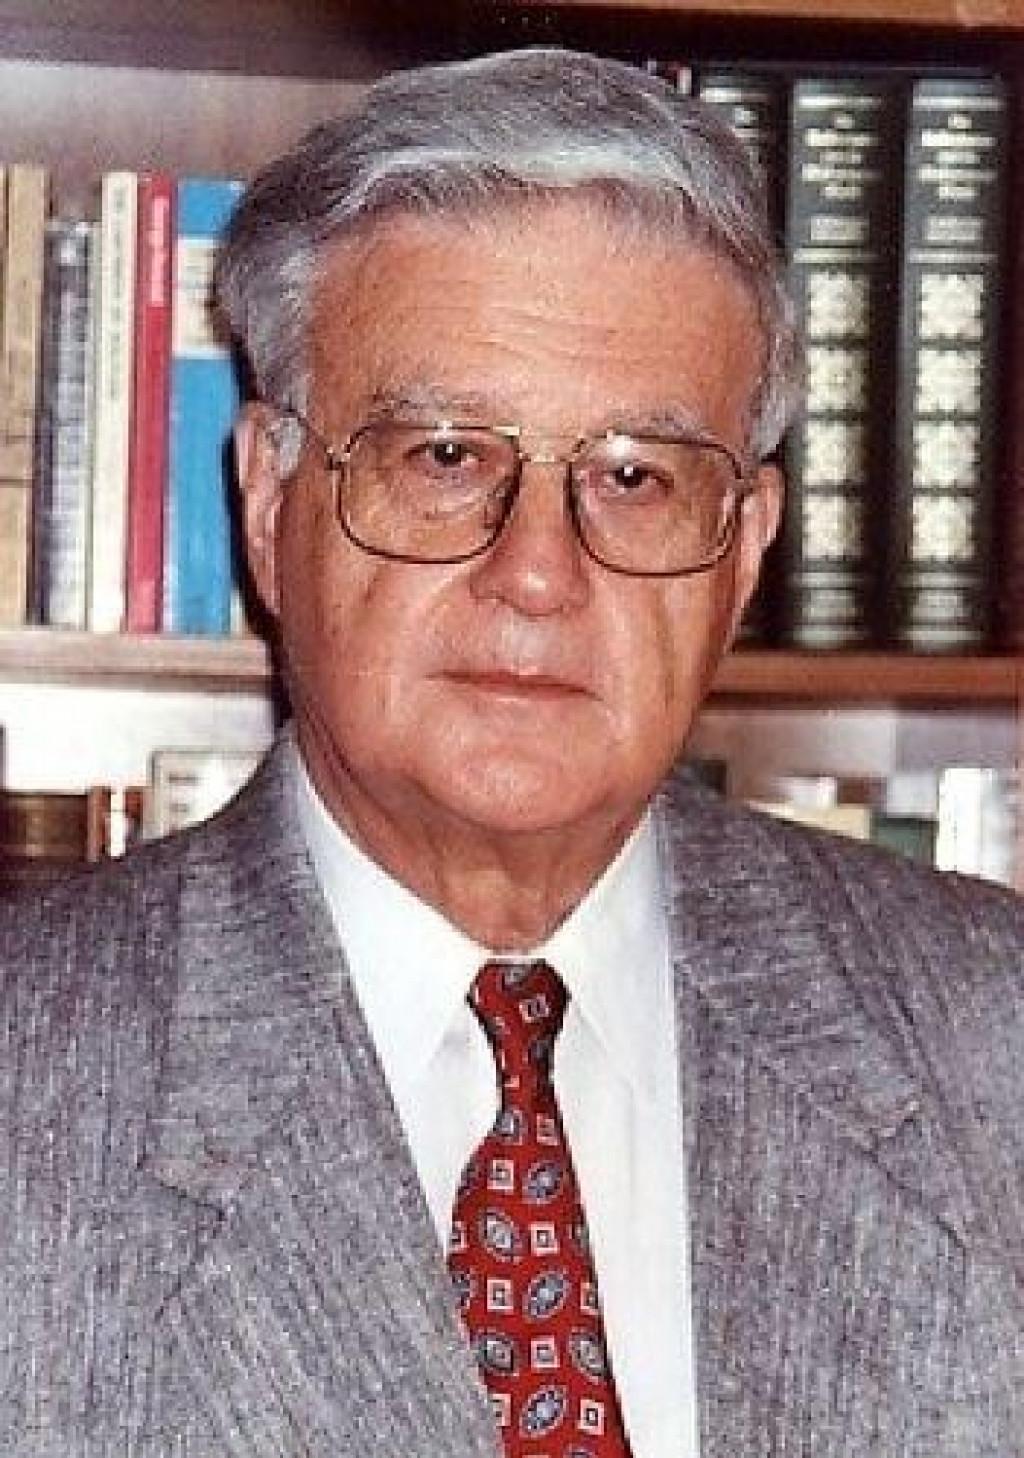 Prof. emer. dr. sc. Bariša Krekić (1928. - 2021.)